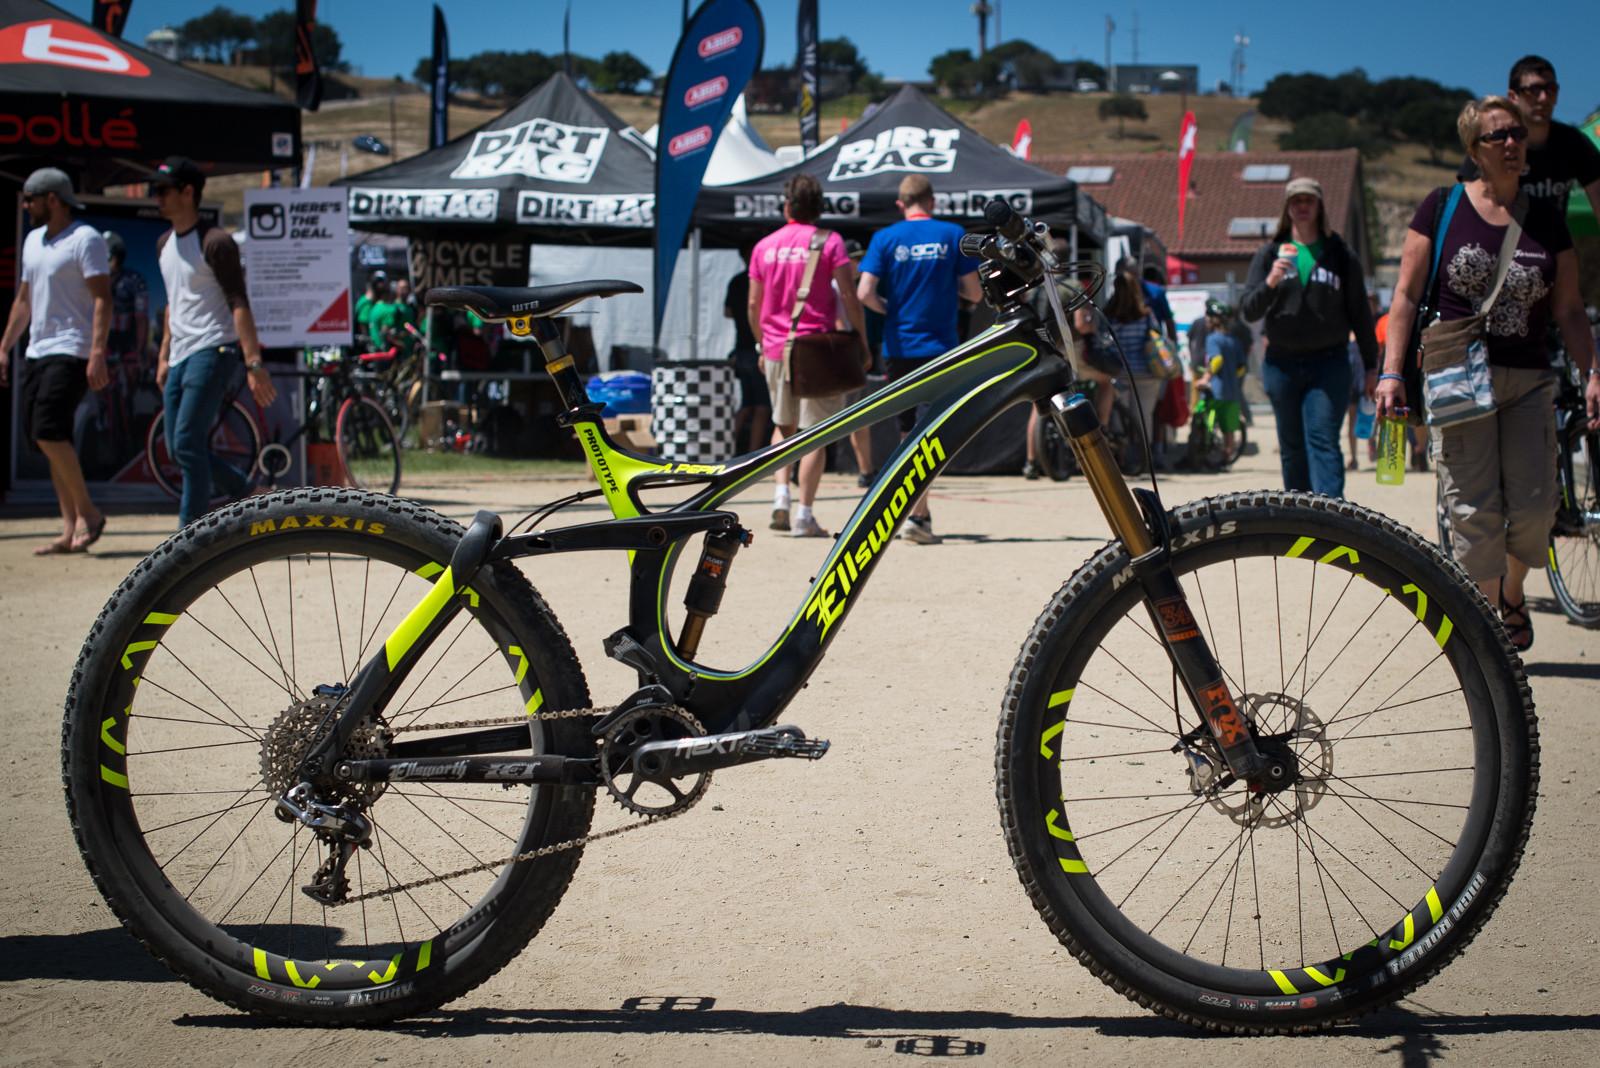 Prototype Ellsworth Moment 27.5 - 2015 Sea Otter Classic Pit Bits - Mountain Biking Pictures - Vital MTB